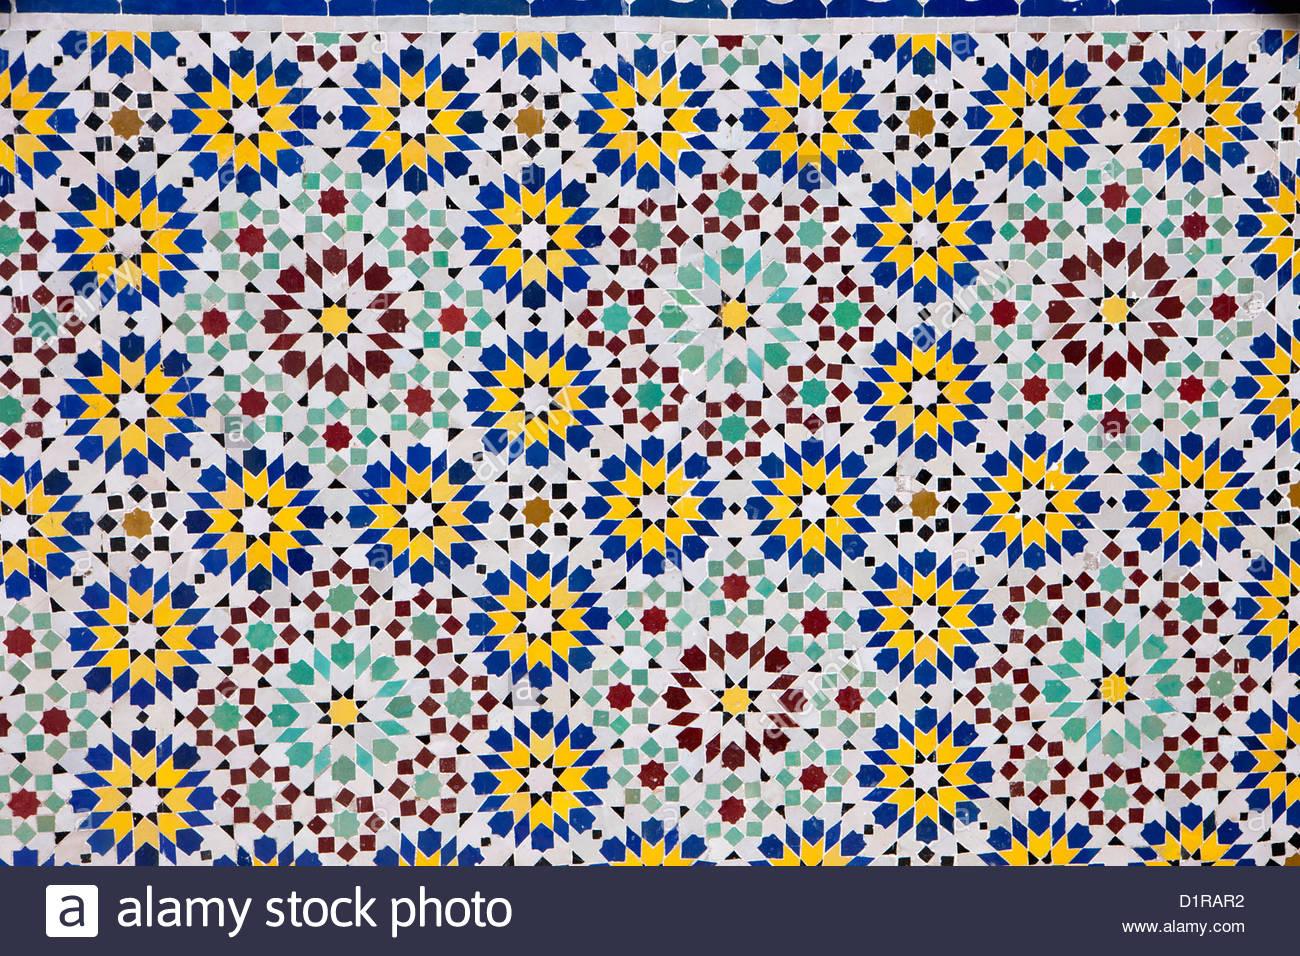 Marokko, Tamegroute, in der Nähe von Zagora, Mosaik. Stockbild